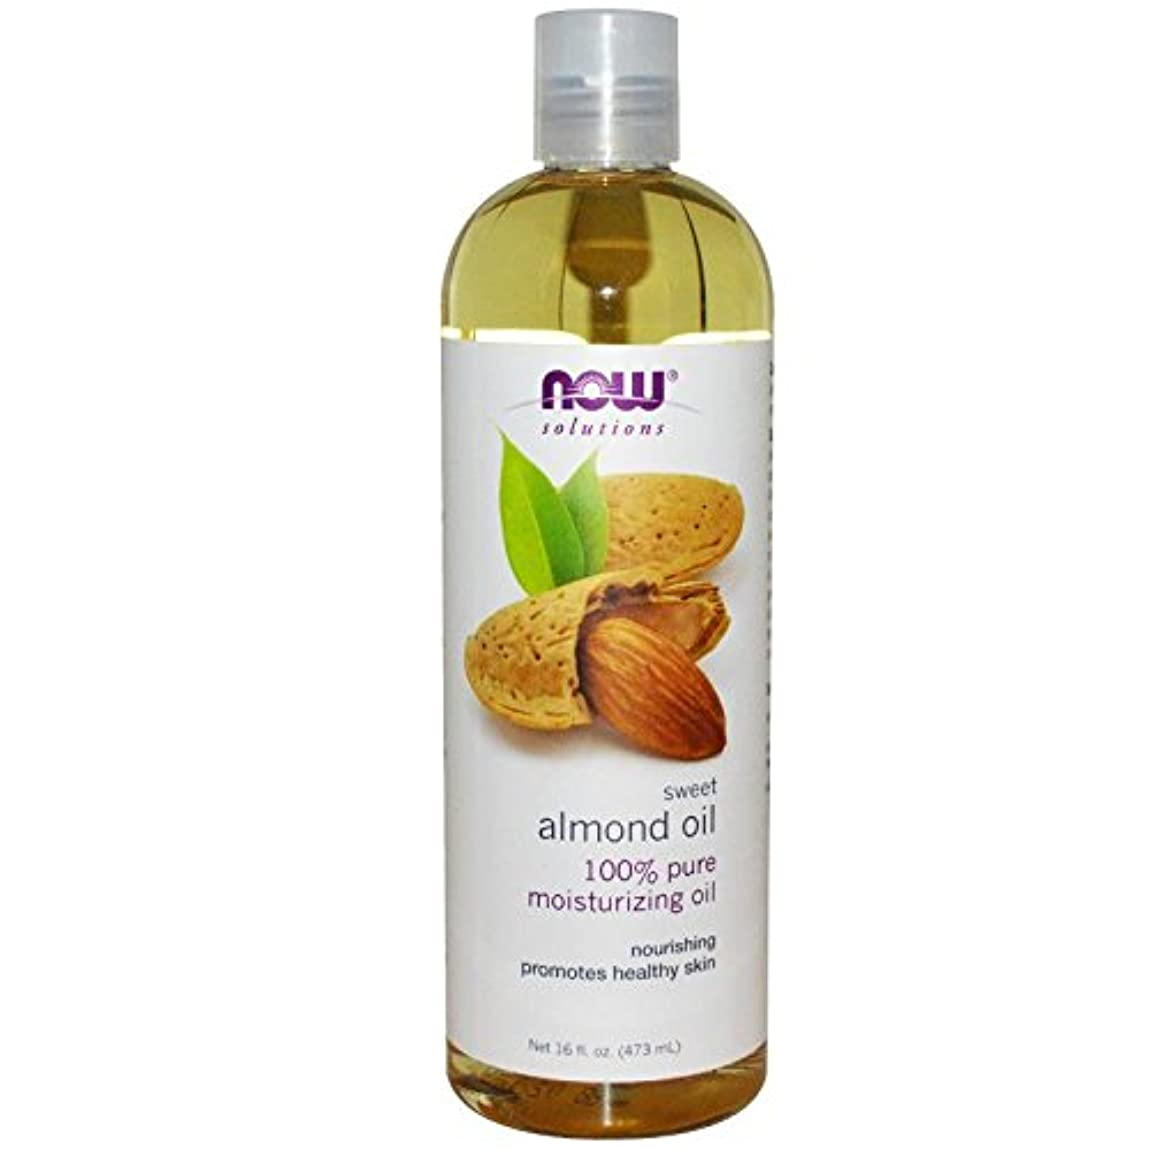 優先権年次コンサート【国内発送】 Now Solutions Sweet Almond Oil 16 oz. (473ml) [並行輸入品]